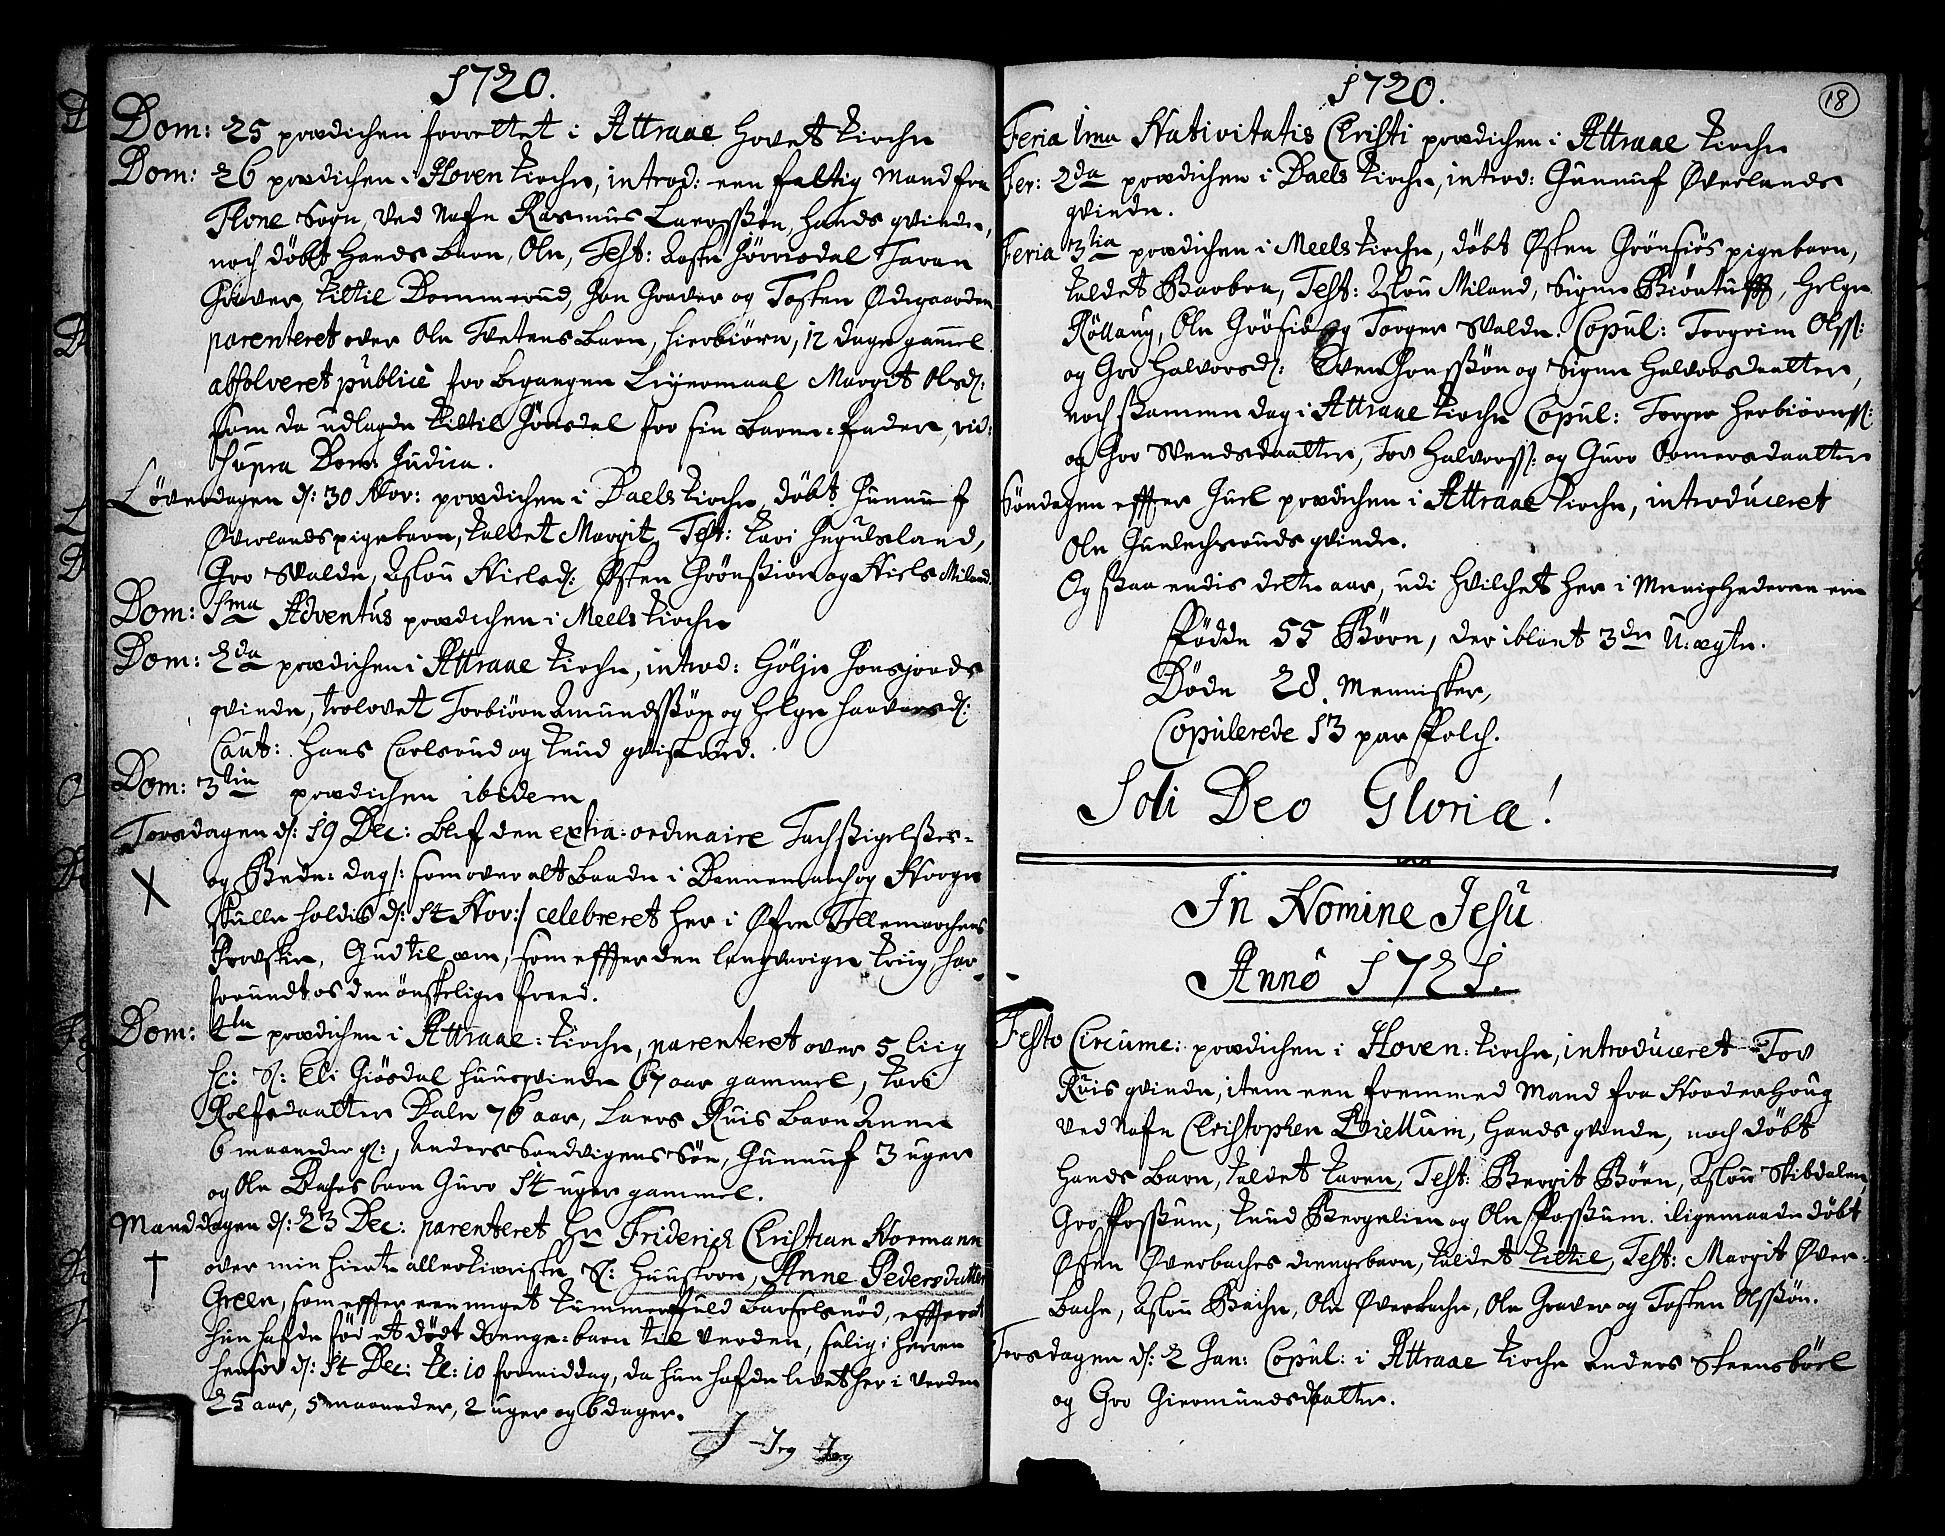 SAKO, Tinn kirkebøker, F/Fa/L0001: Ministerialbok nr. I 1, 1717-1734, s. 18